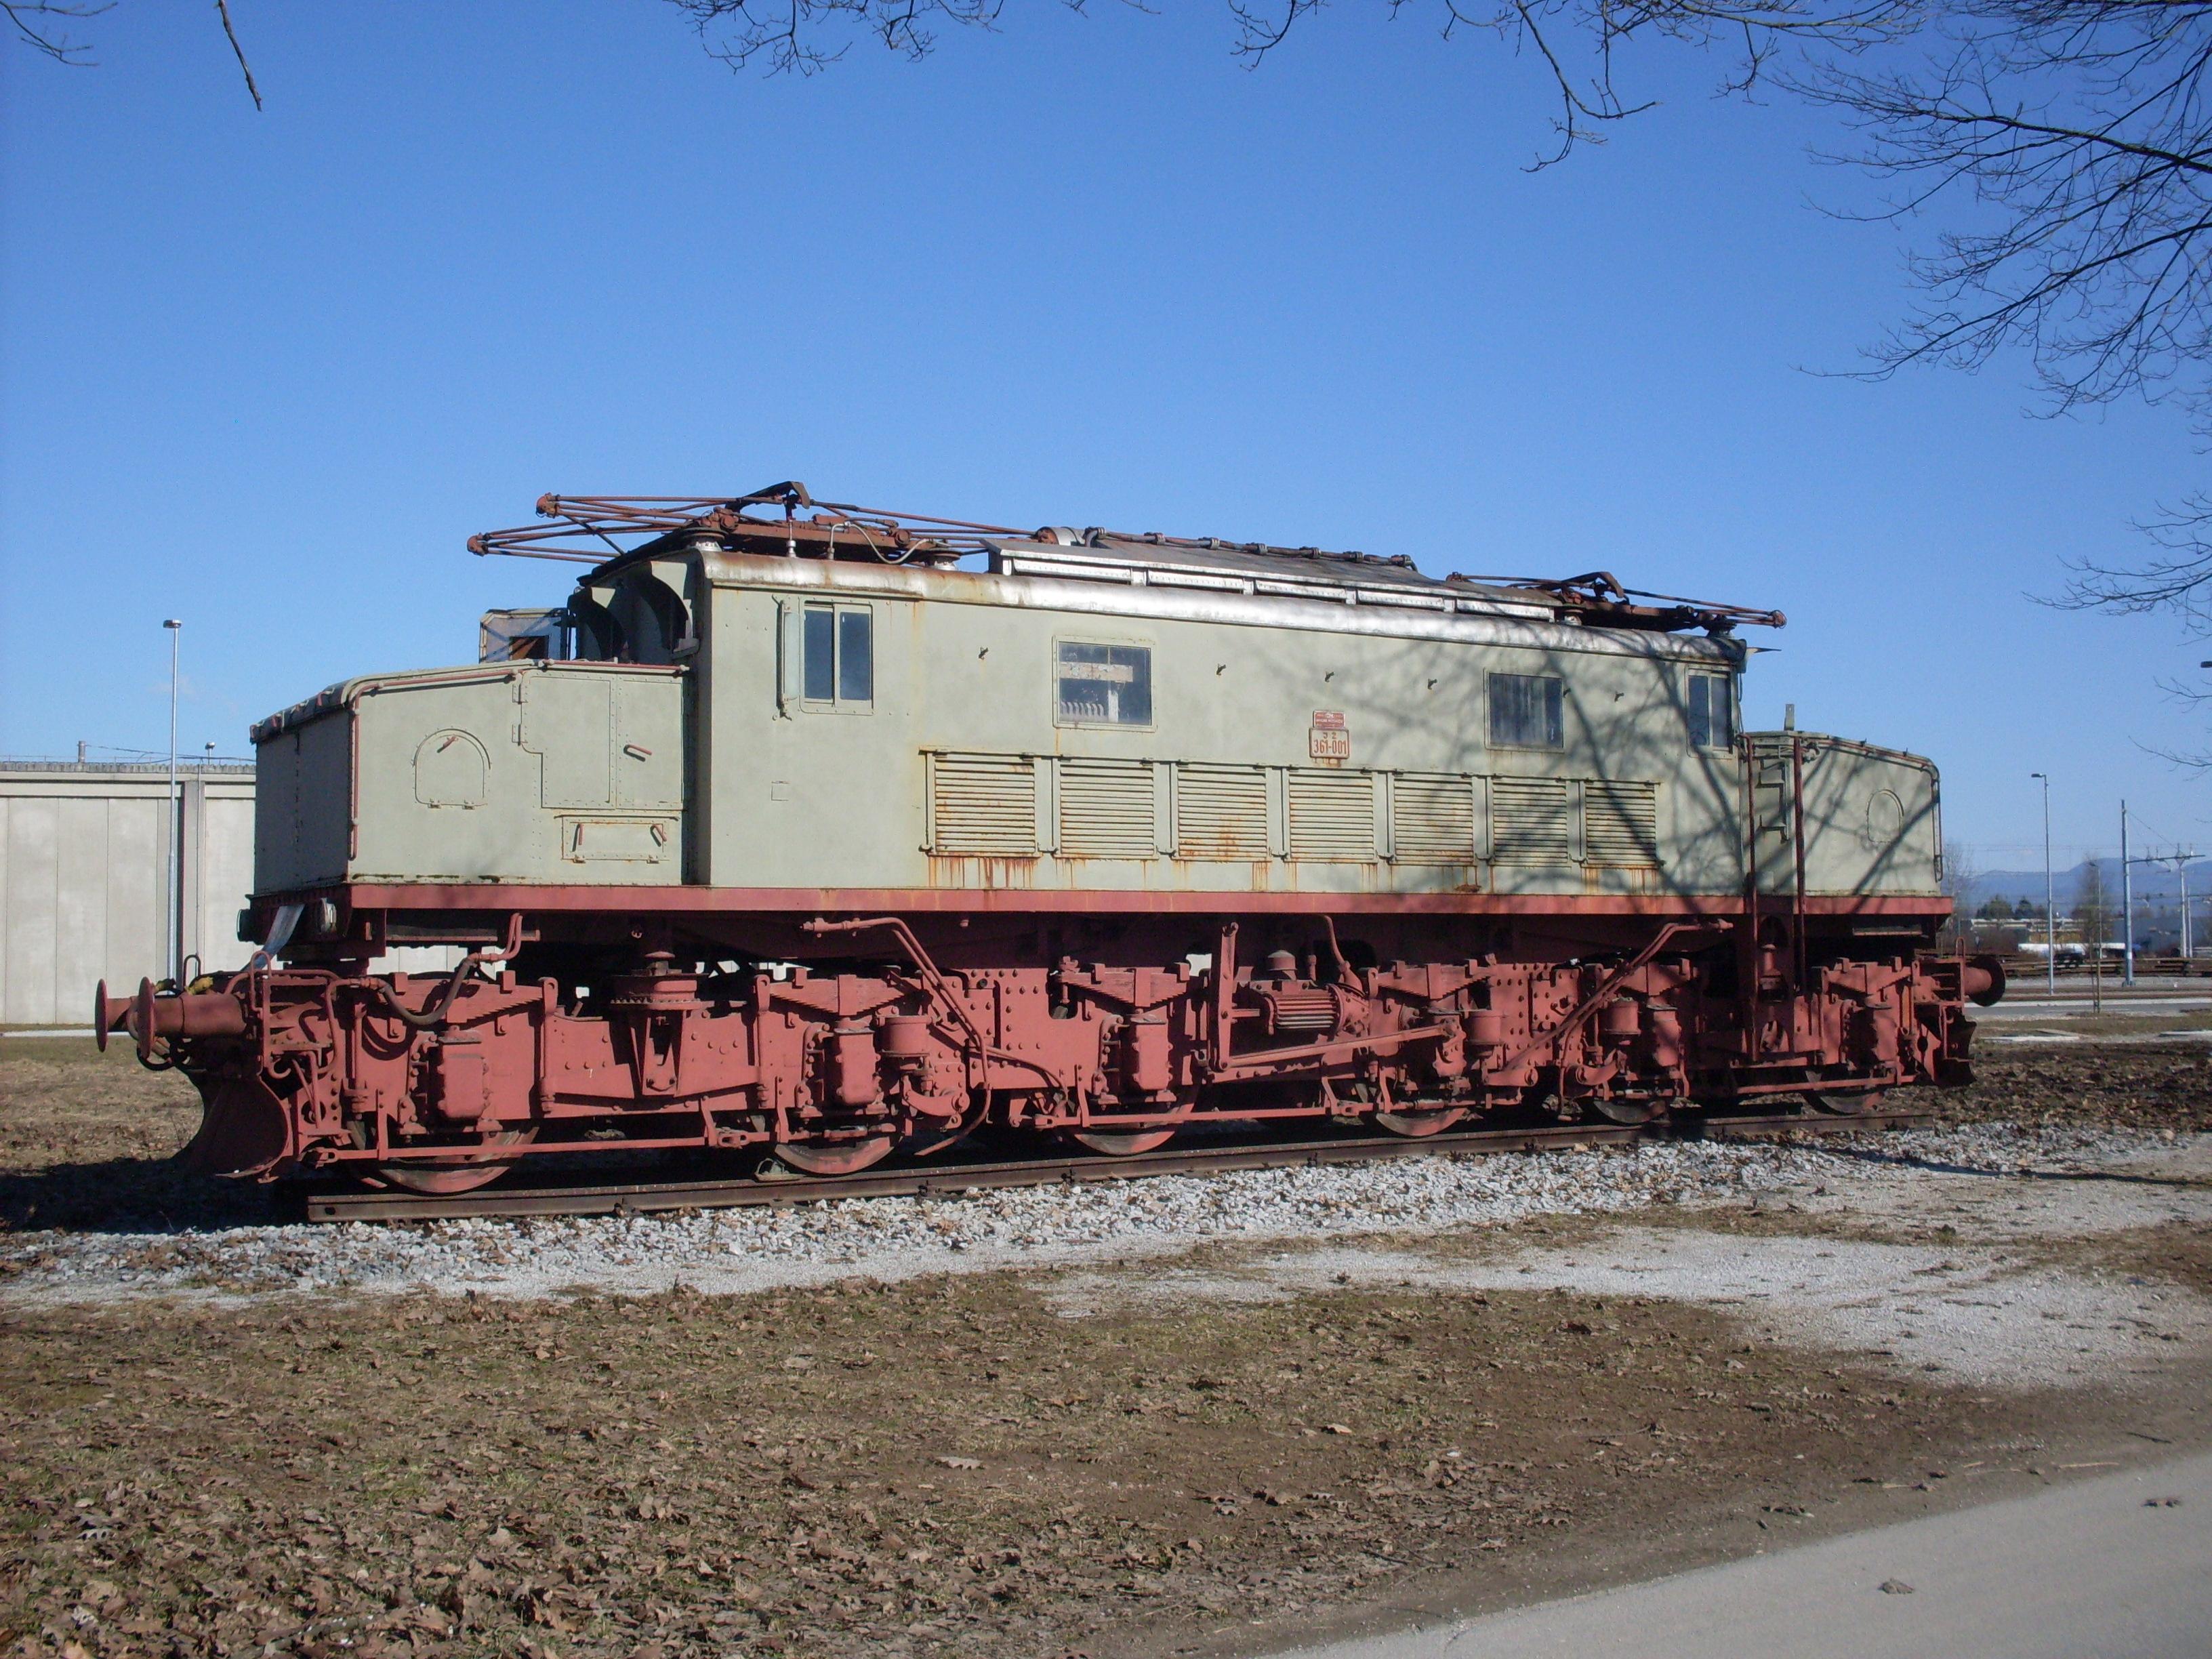 CD_Moste-electric_locomotive_JZ_361-001-